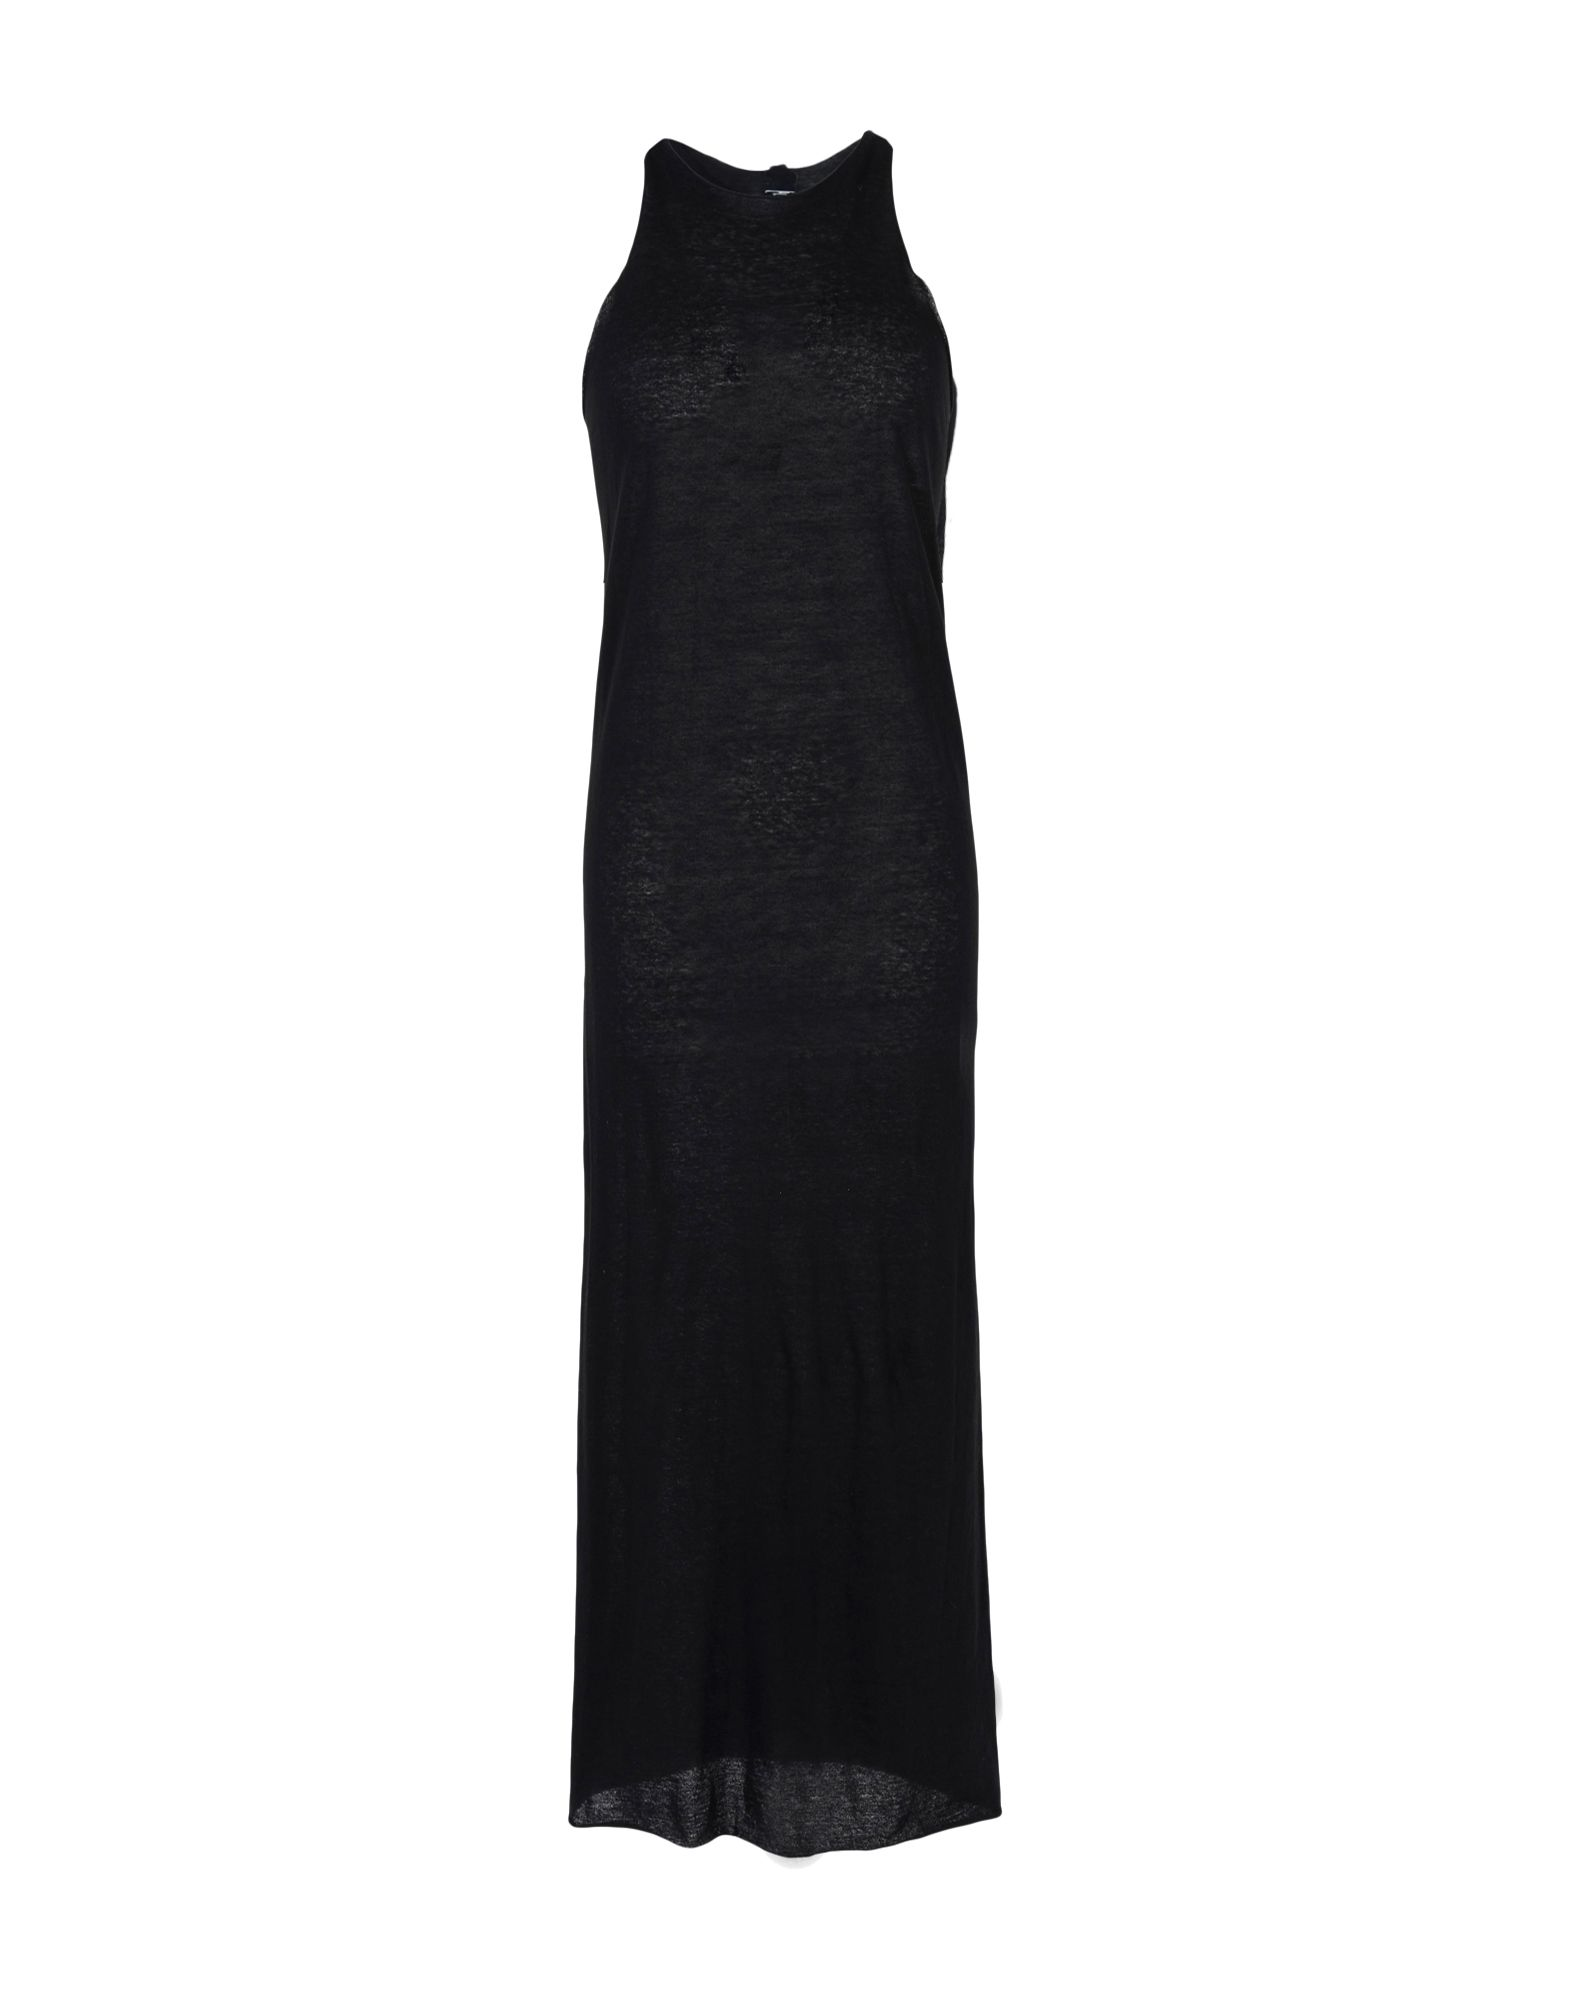 Фото - MTF MARIA TURRI Платье длиной 3/4 maria grachvogel платье длиной 3 4